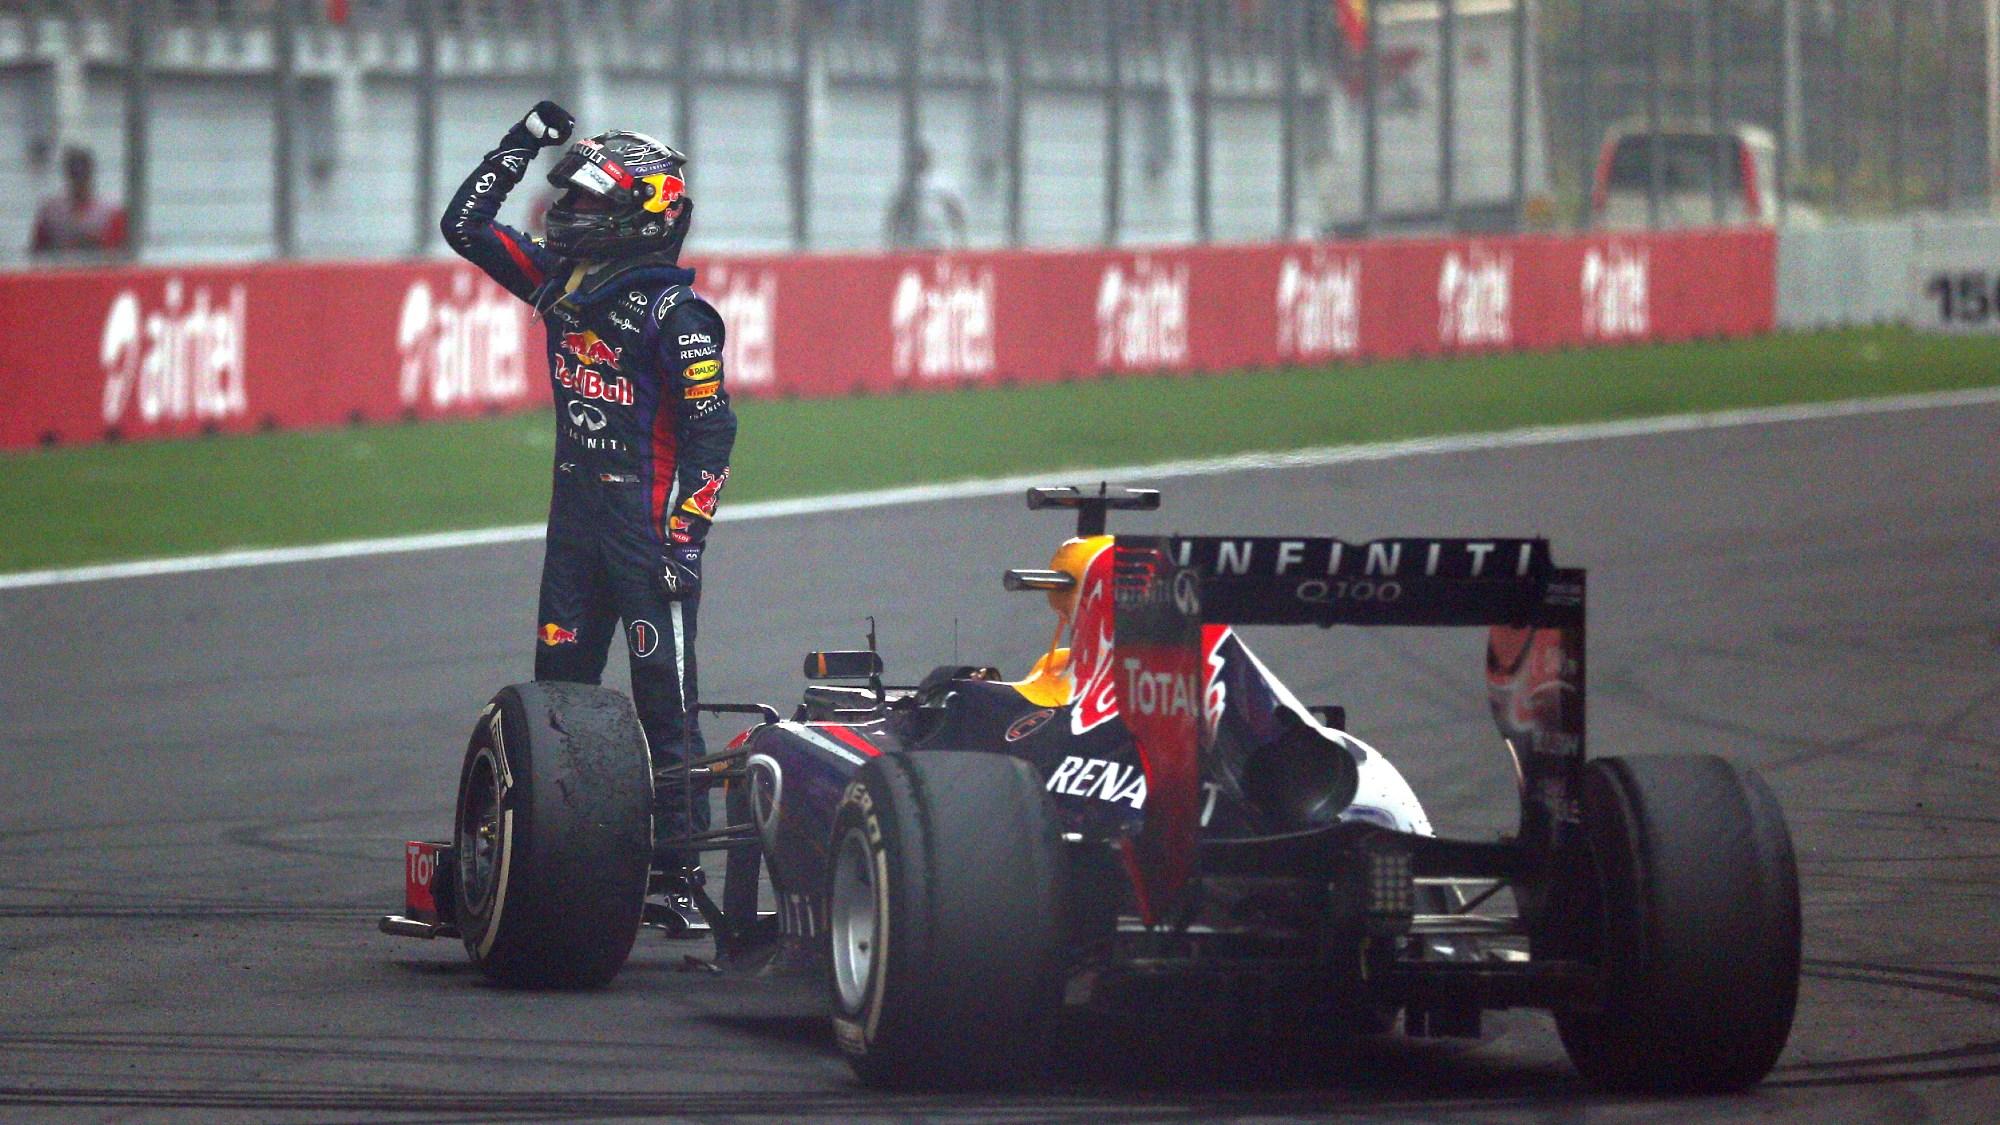 Sebastian Vettel, 2013 Indian Grand Prix